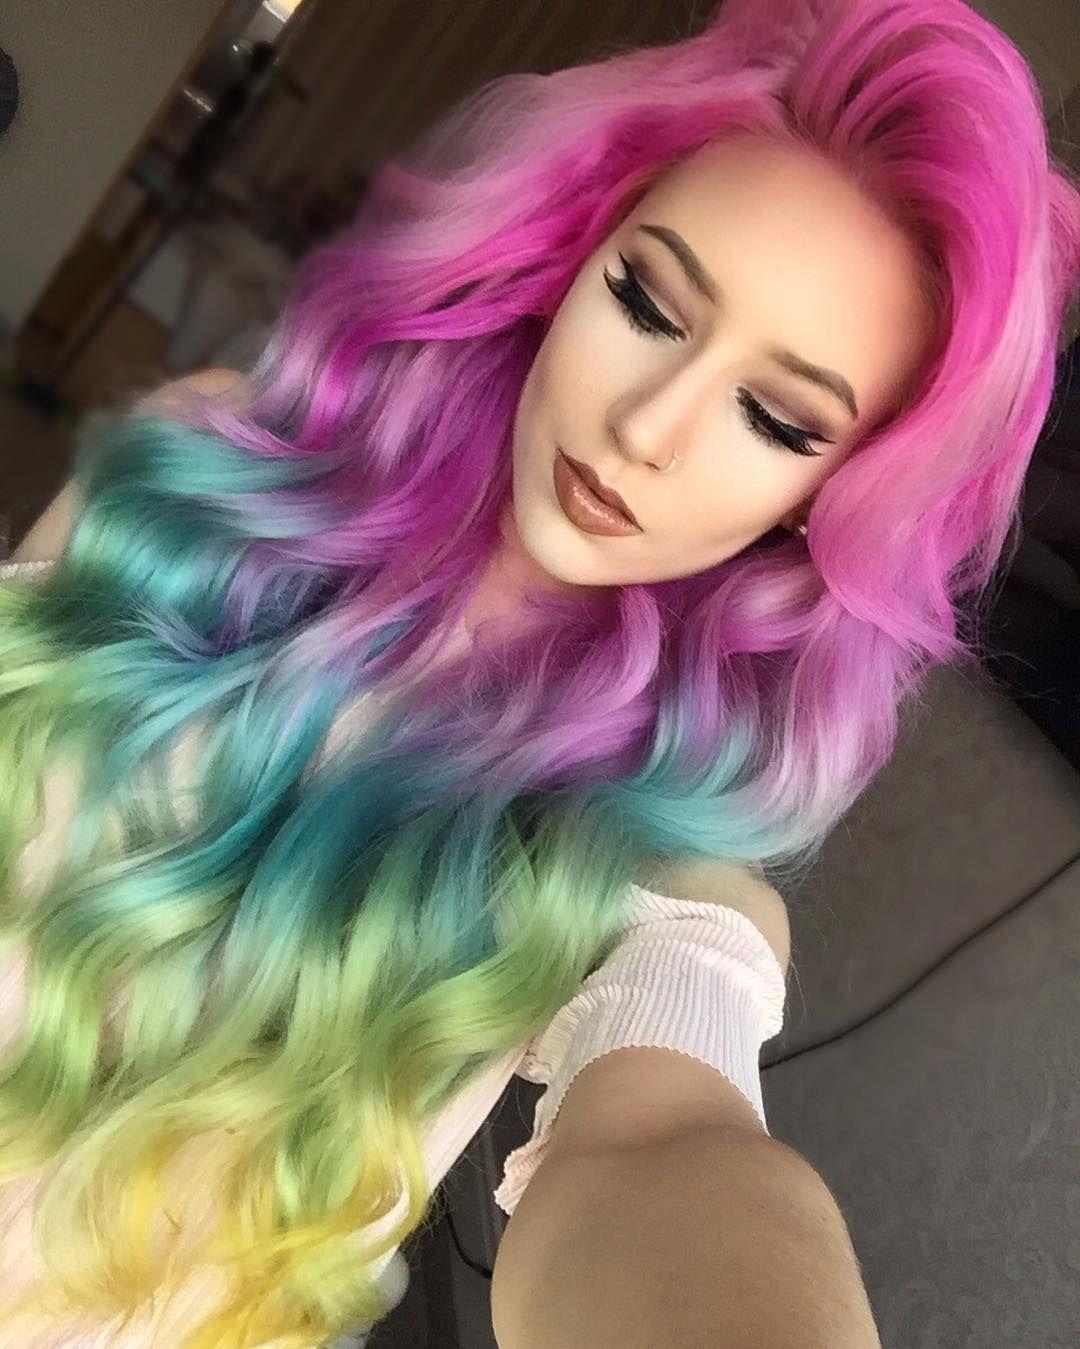 Pin By Keira Patel On Hair Hacks Pinterest Hair Rainbow Hair